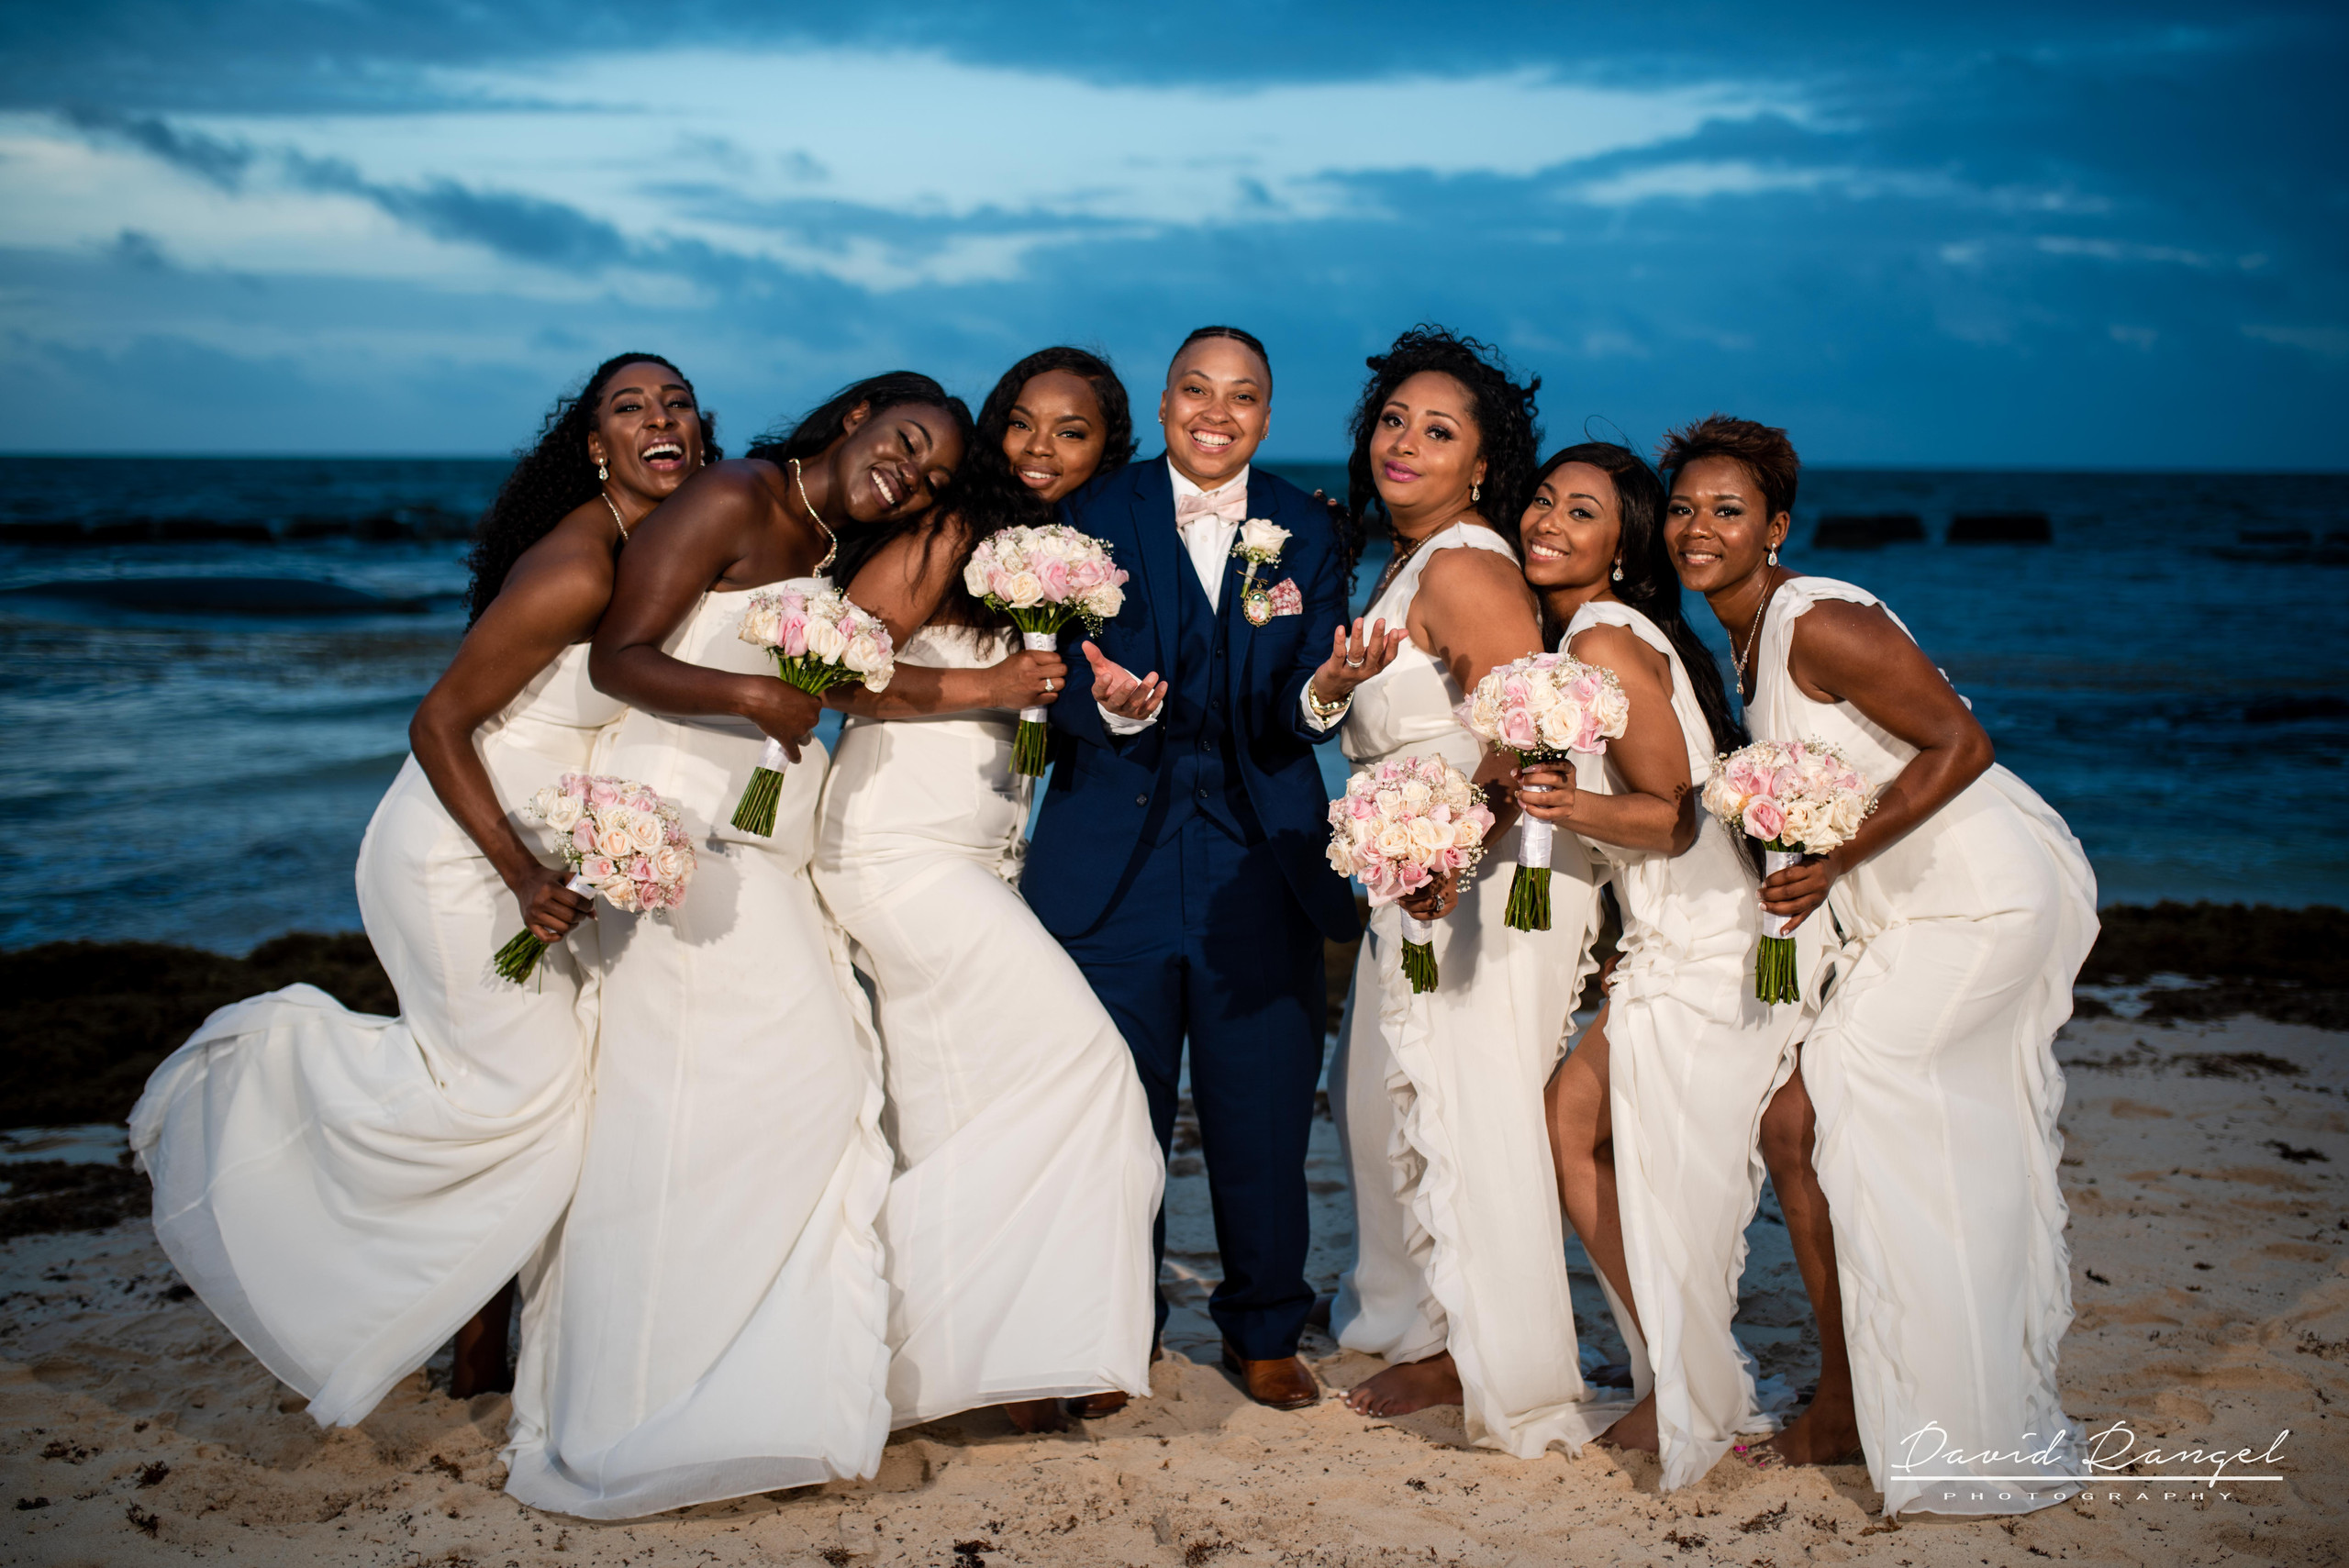 brides+maids+beach+session+photo